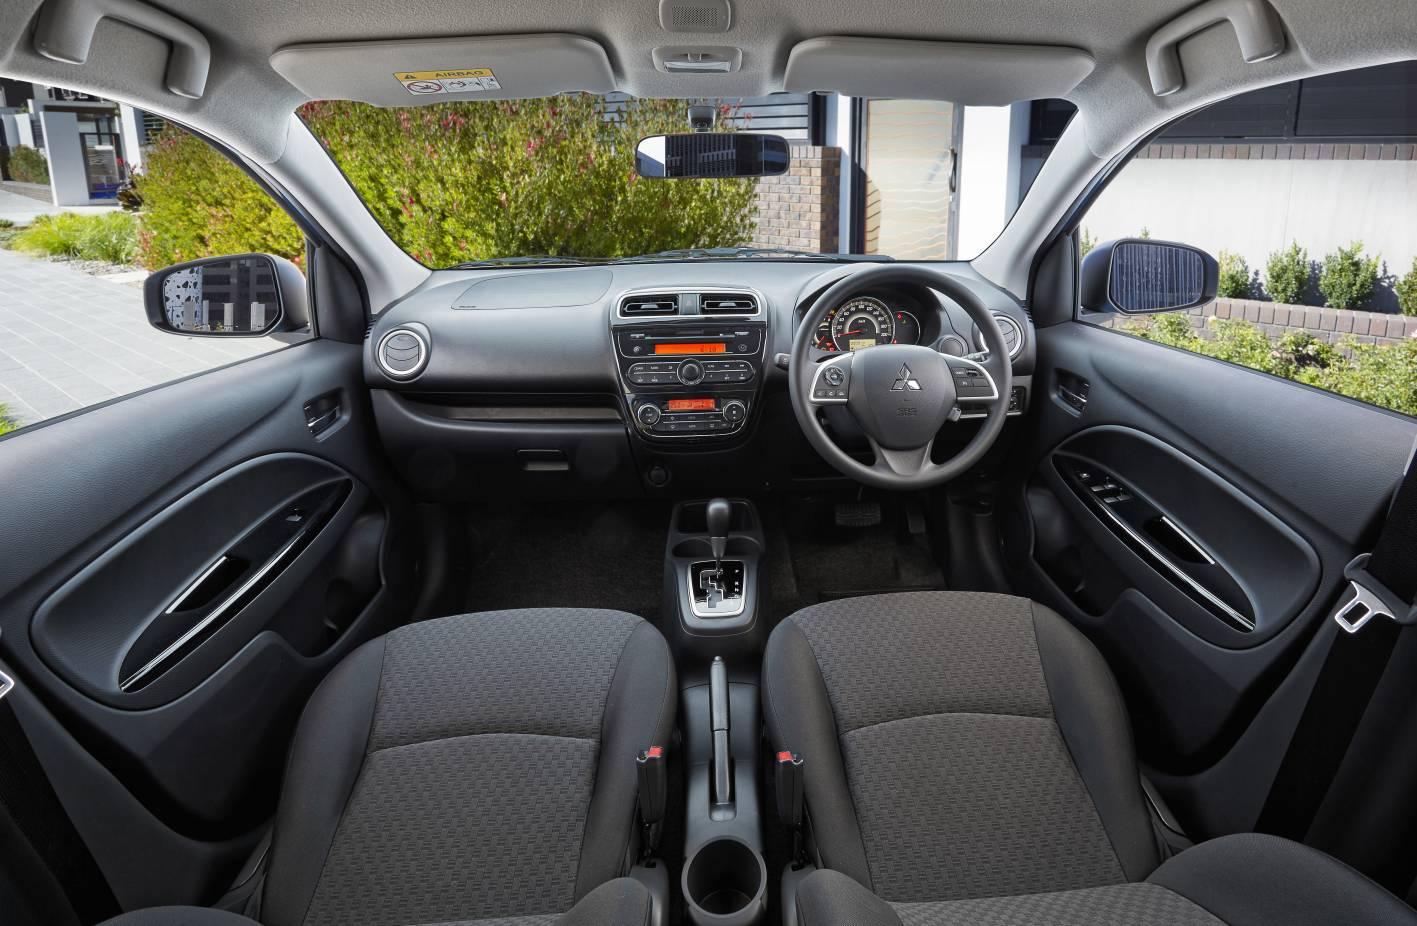 Mitsubishi Cars News Mitsubishi Mirage Facelifted For 2016